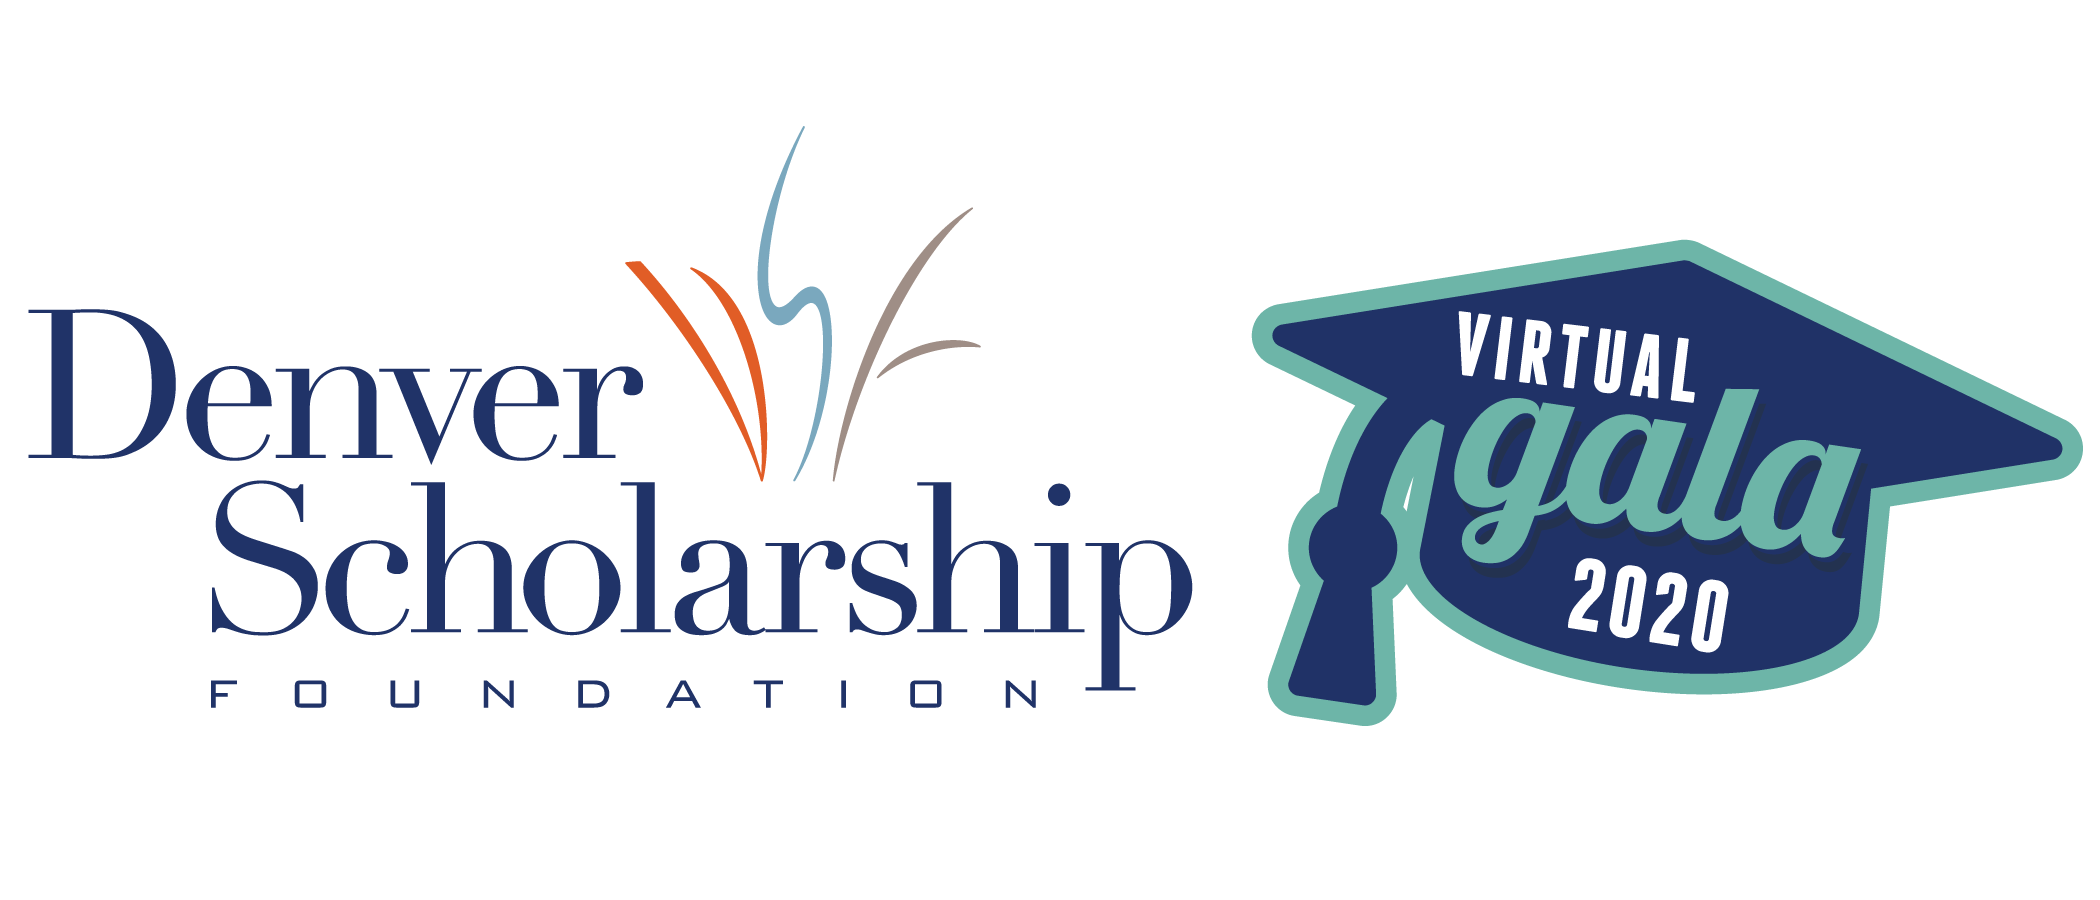 Denver Scholarship Foundation 2020 Virtual Gala Logo